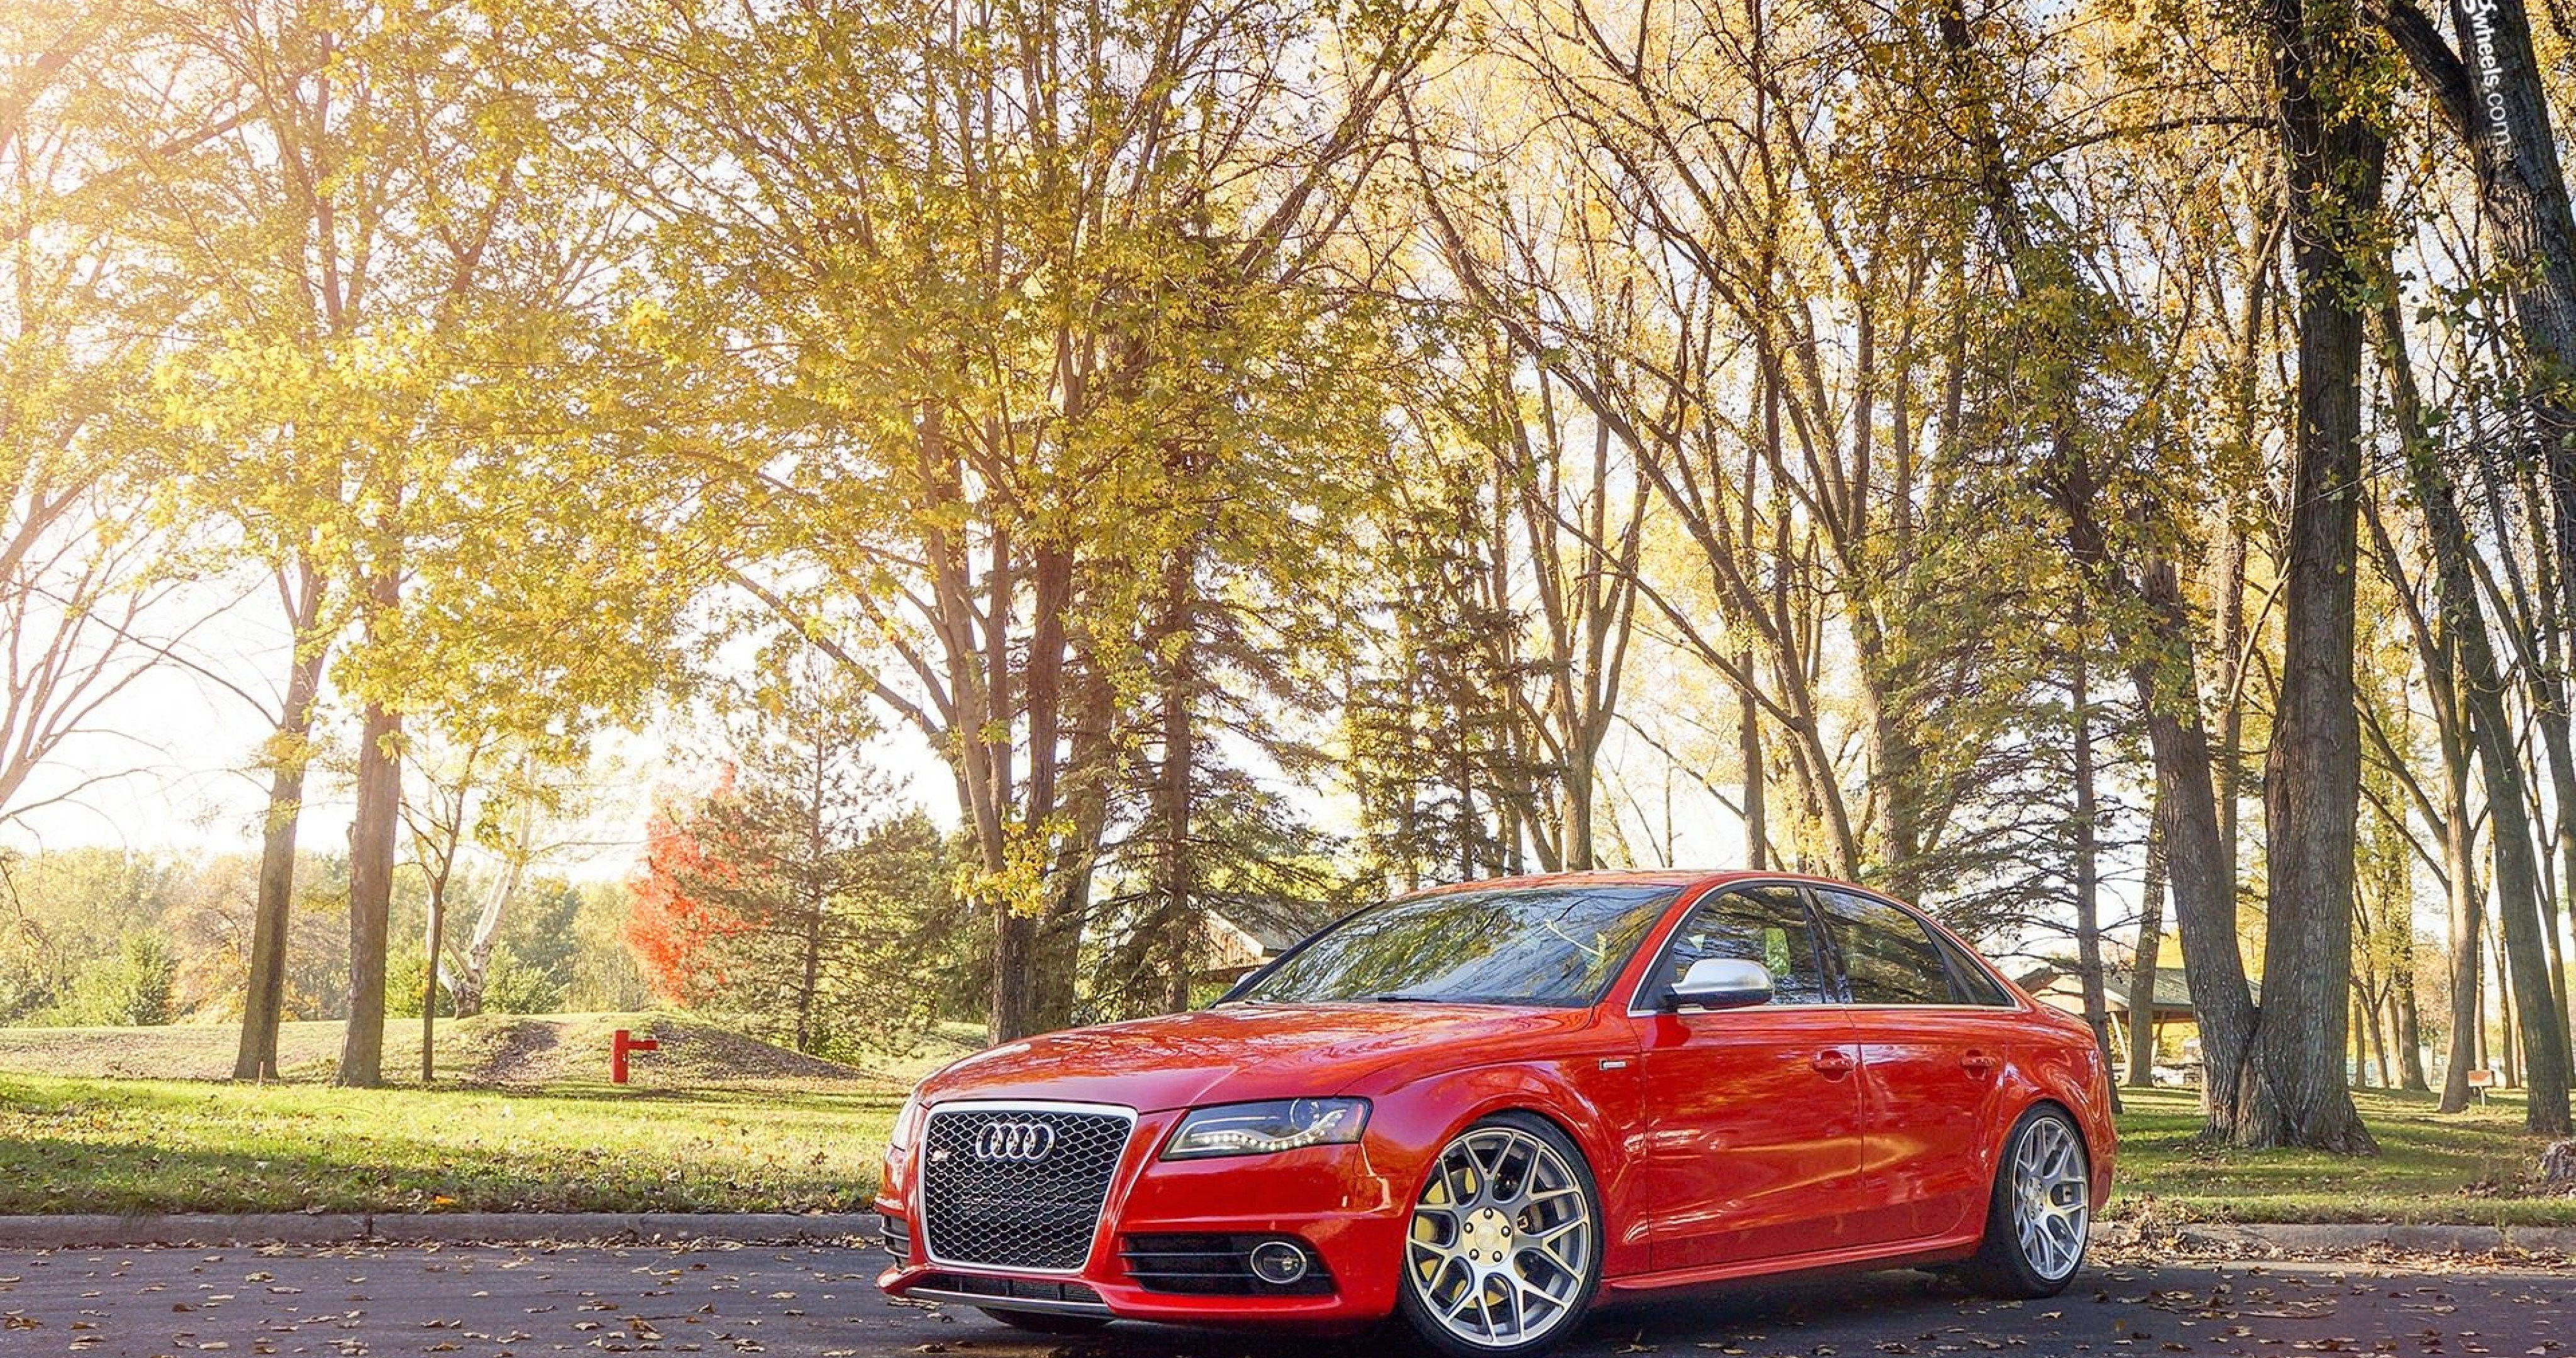 Audi S4 Red 4k Ultra Hd Wallpaper Ololoshenka Pinterest Hd